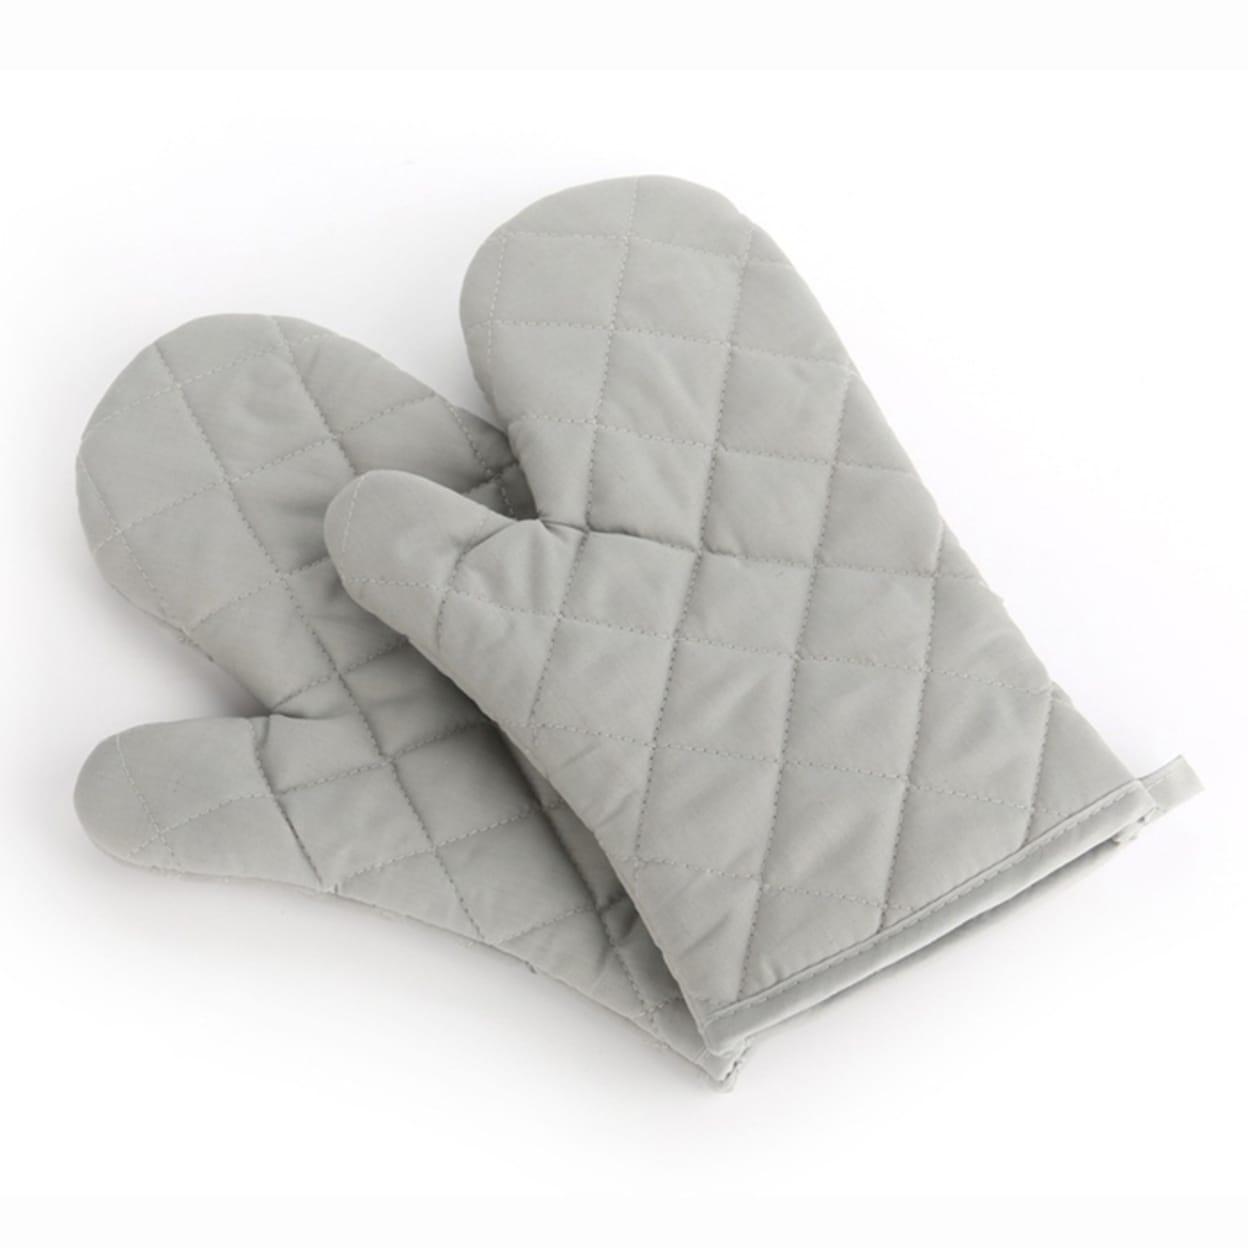 2pcs Oven Gloves 100/% Heat Resistant Cotton Oven Gauntlet Mitts